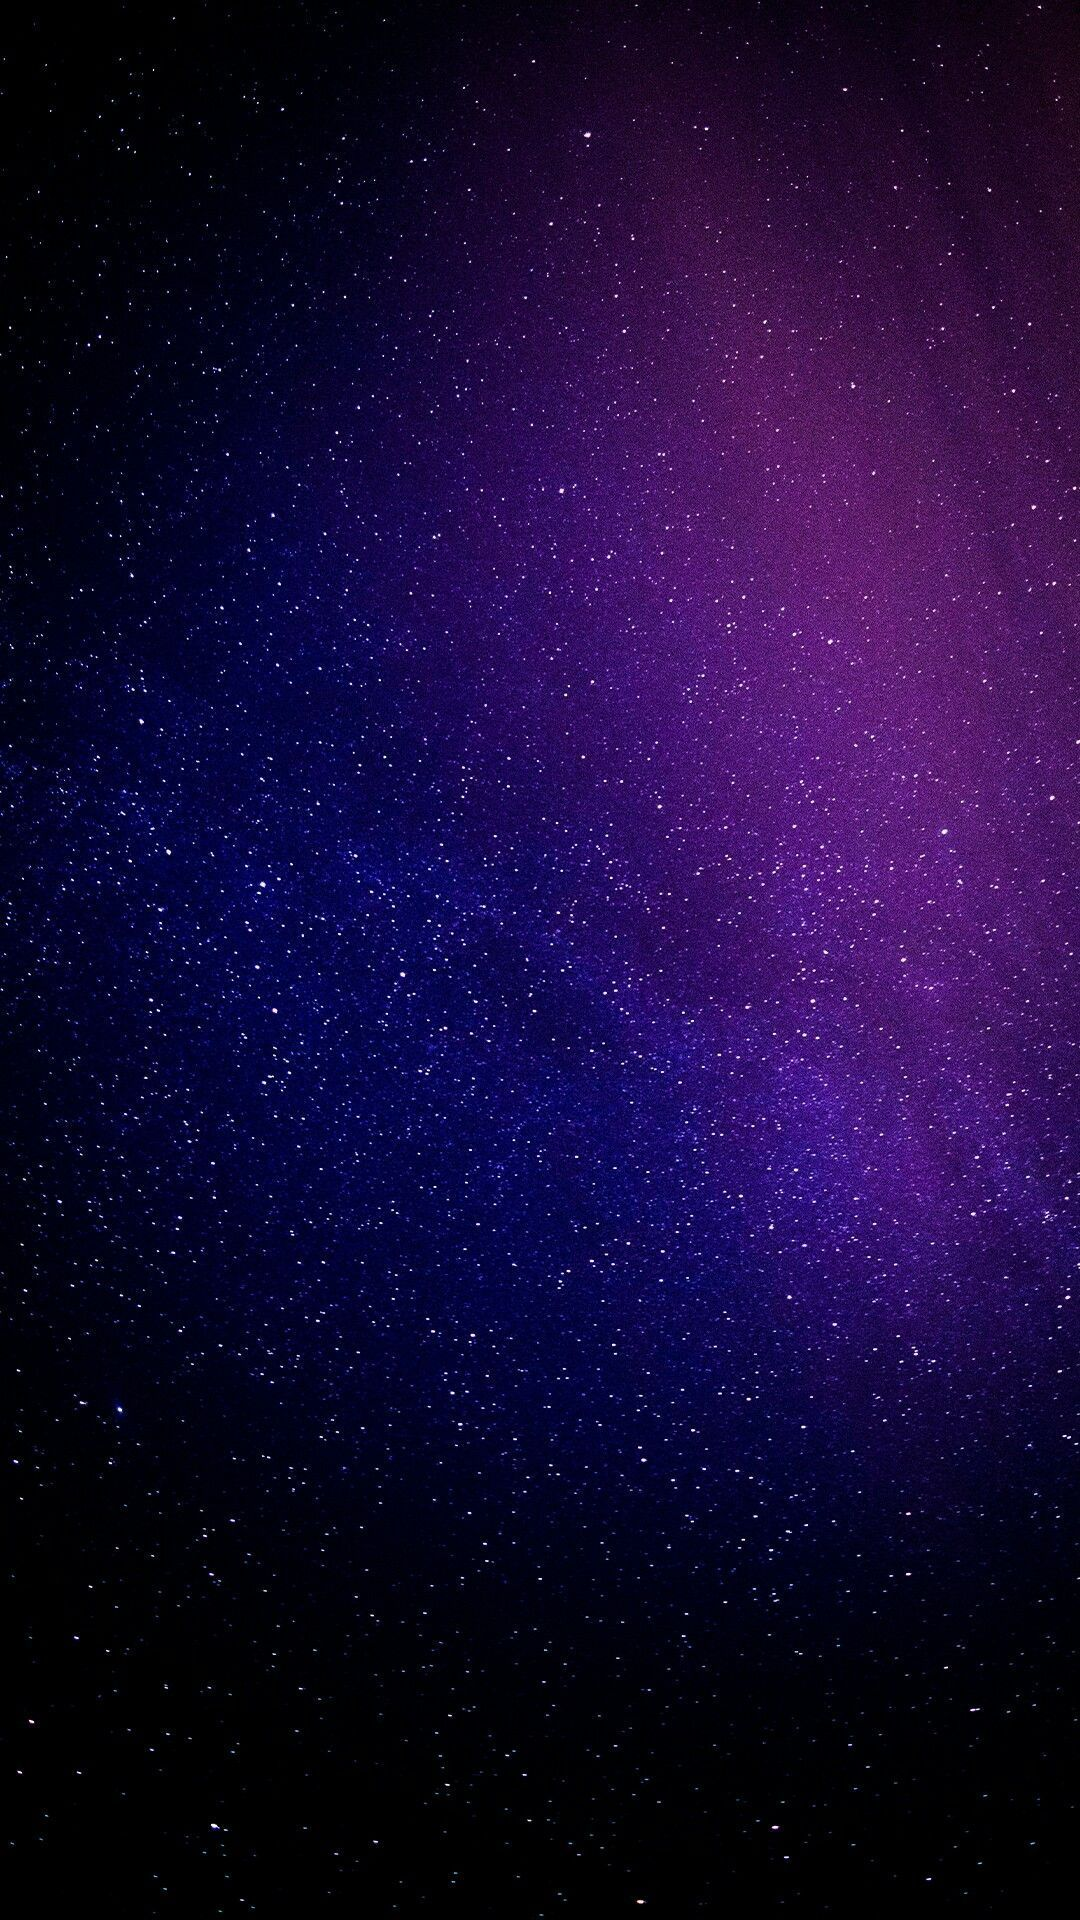 Galaxy Universe Milky Way Sky Blue Star Wallpaper Backgrounds Galaxy Universe Wallpapers Back Star Wallpaper Blue Star Wallpaper Night Sky Wallpaper